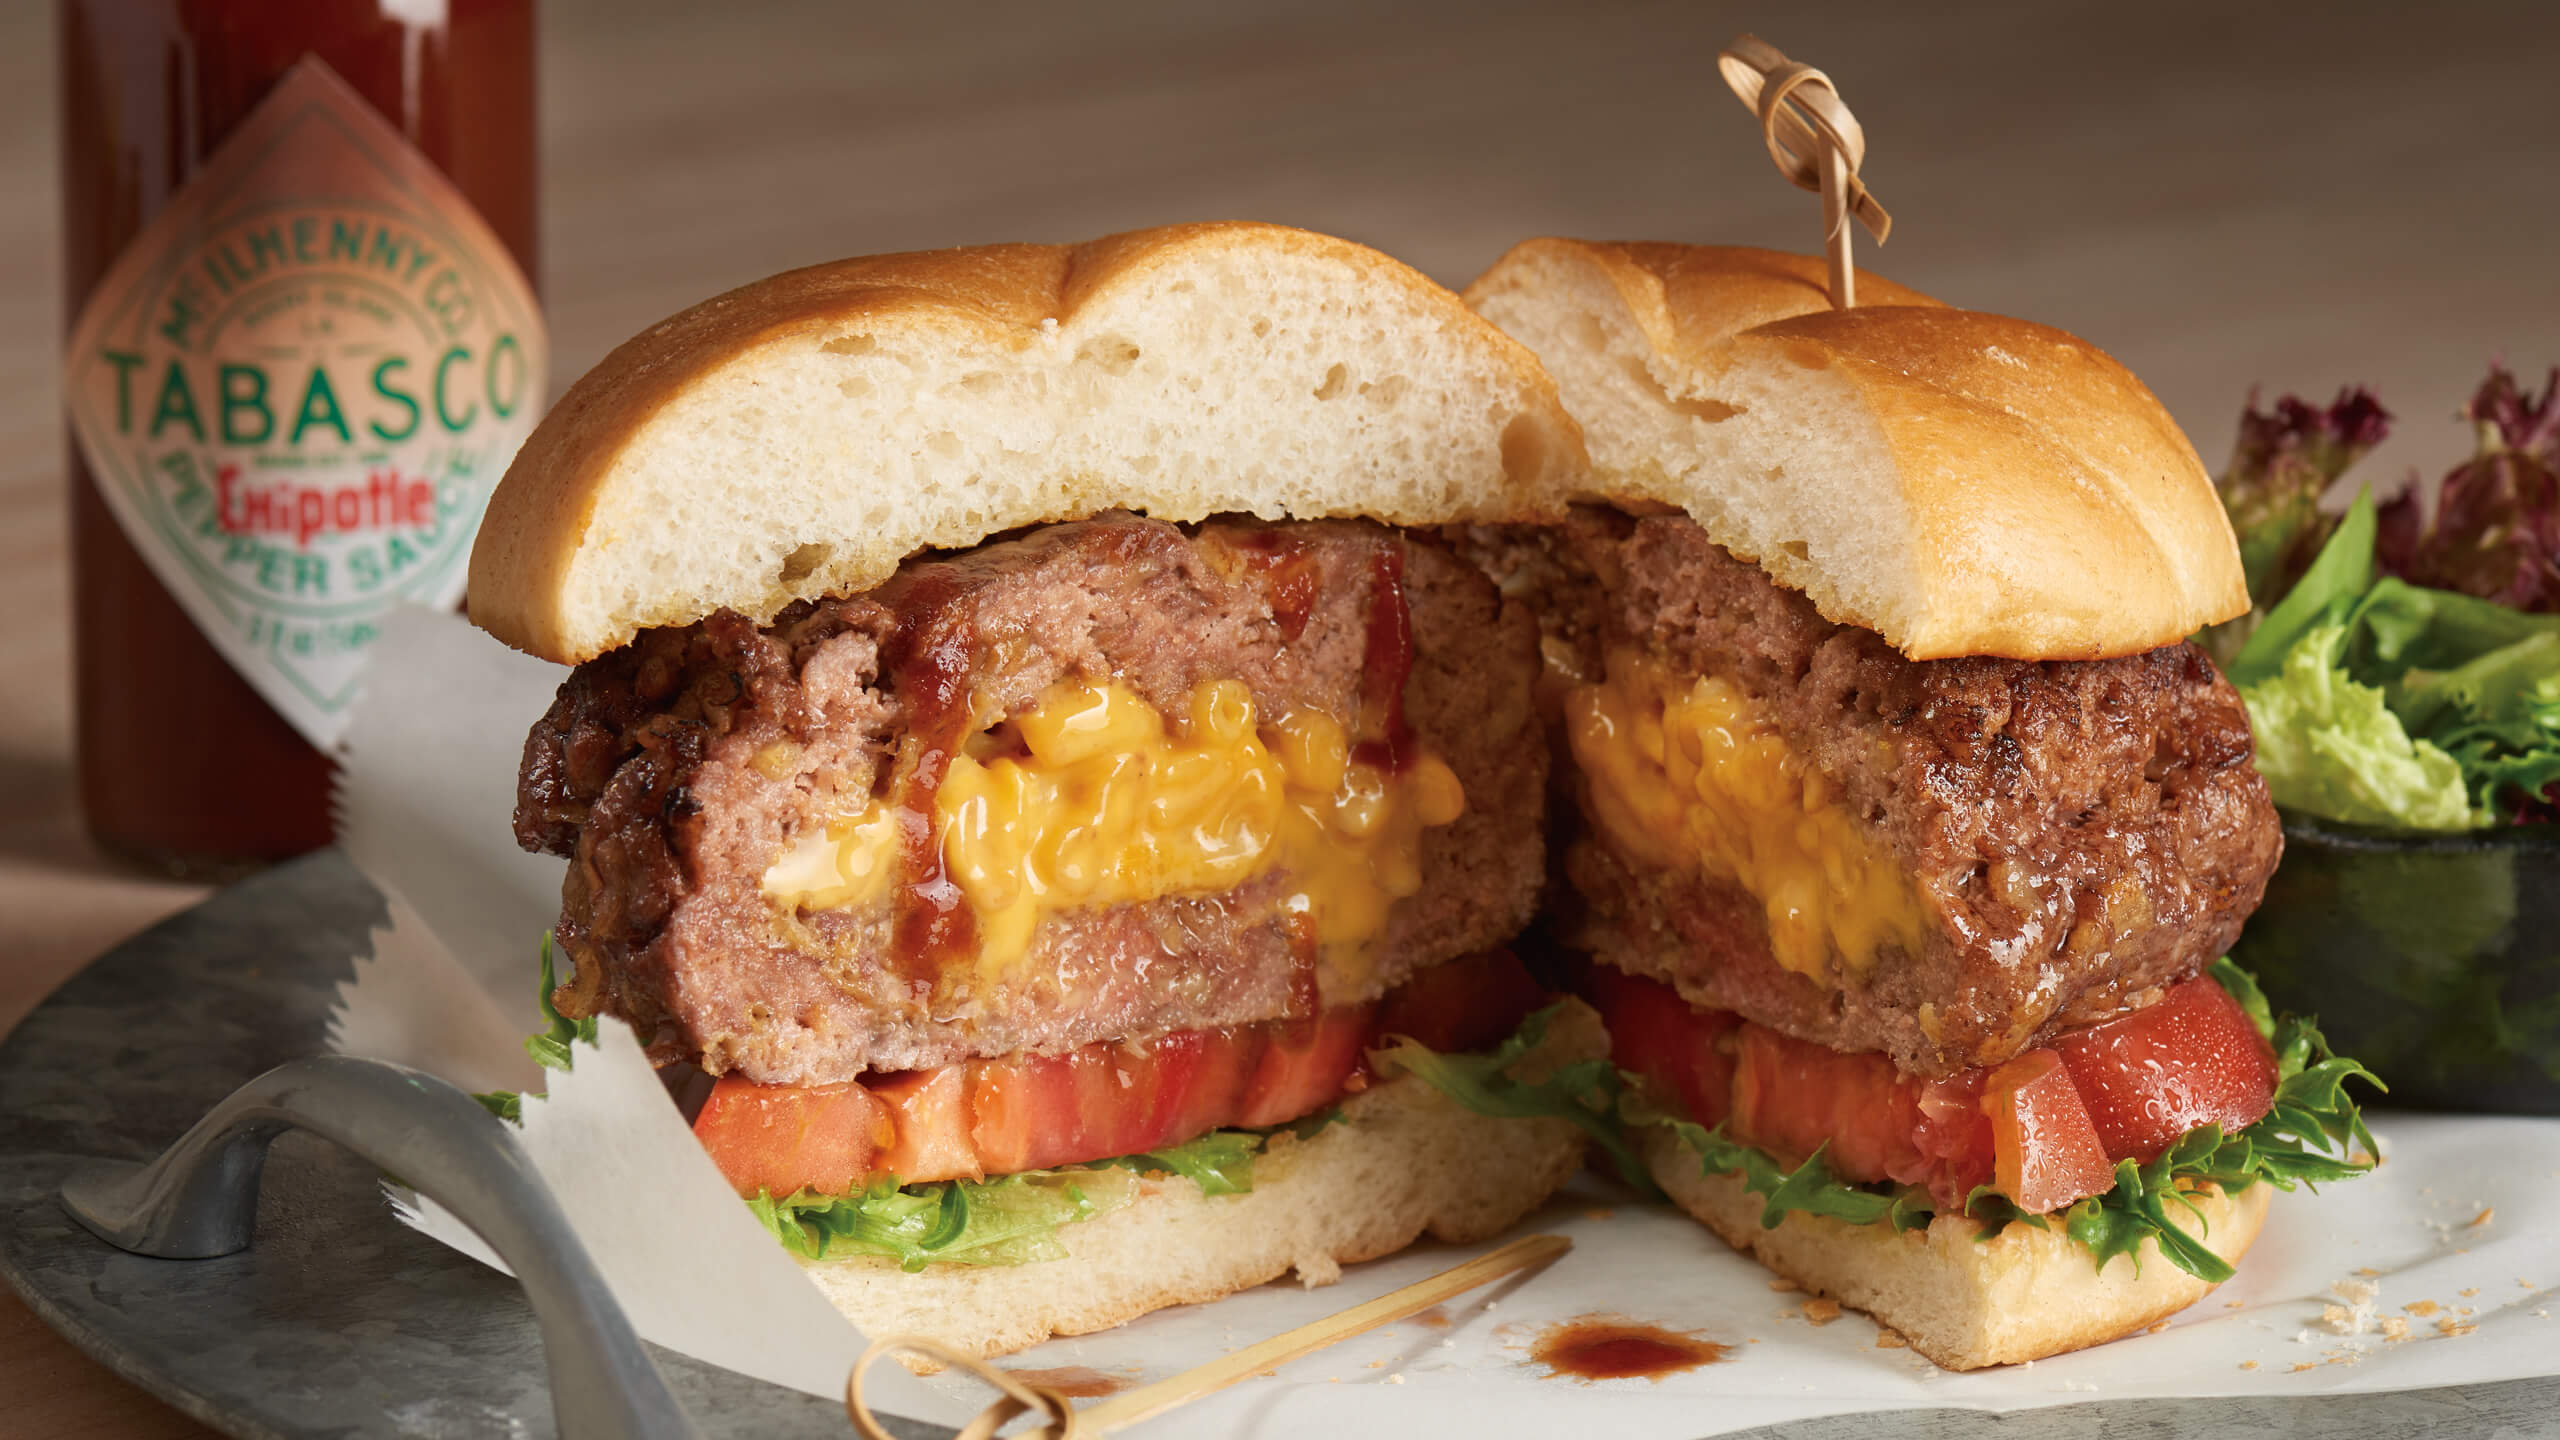 Mac & Cheese—Stuffed Burger